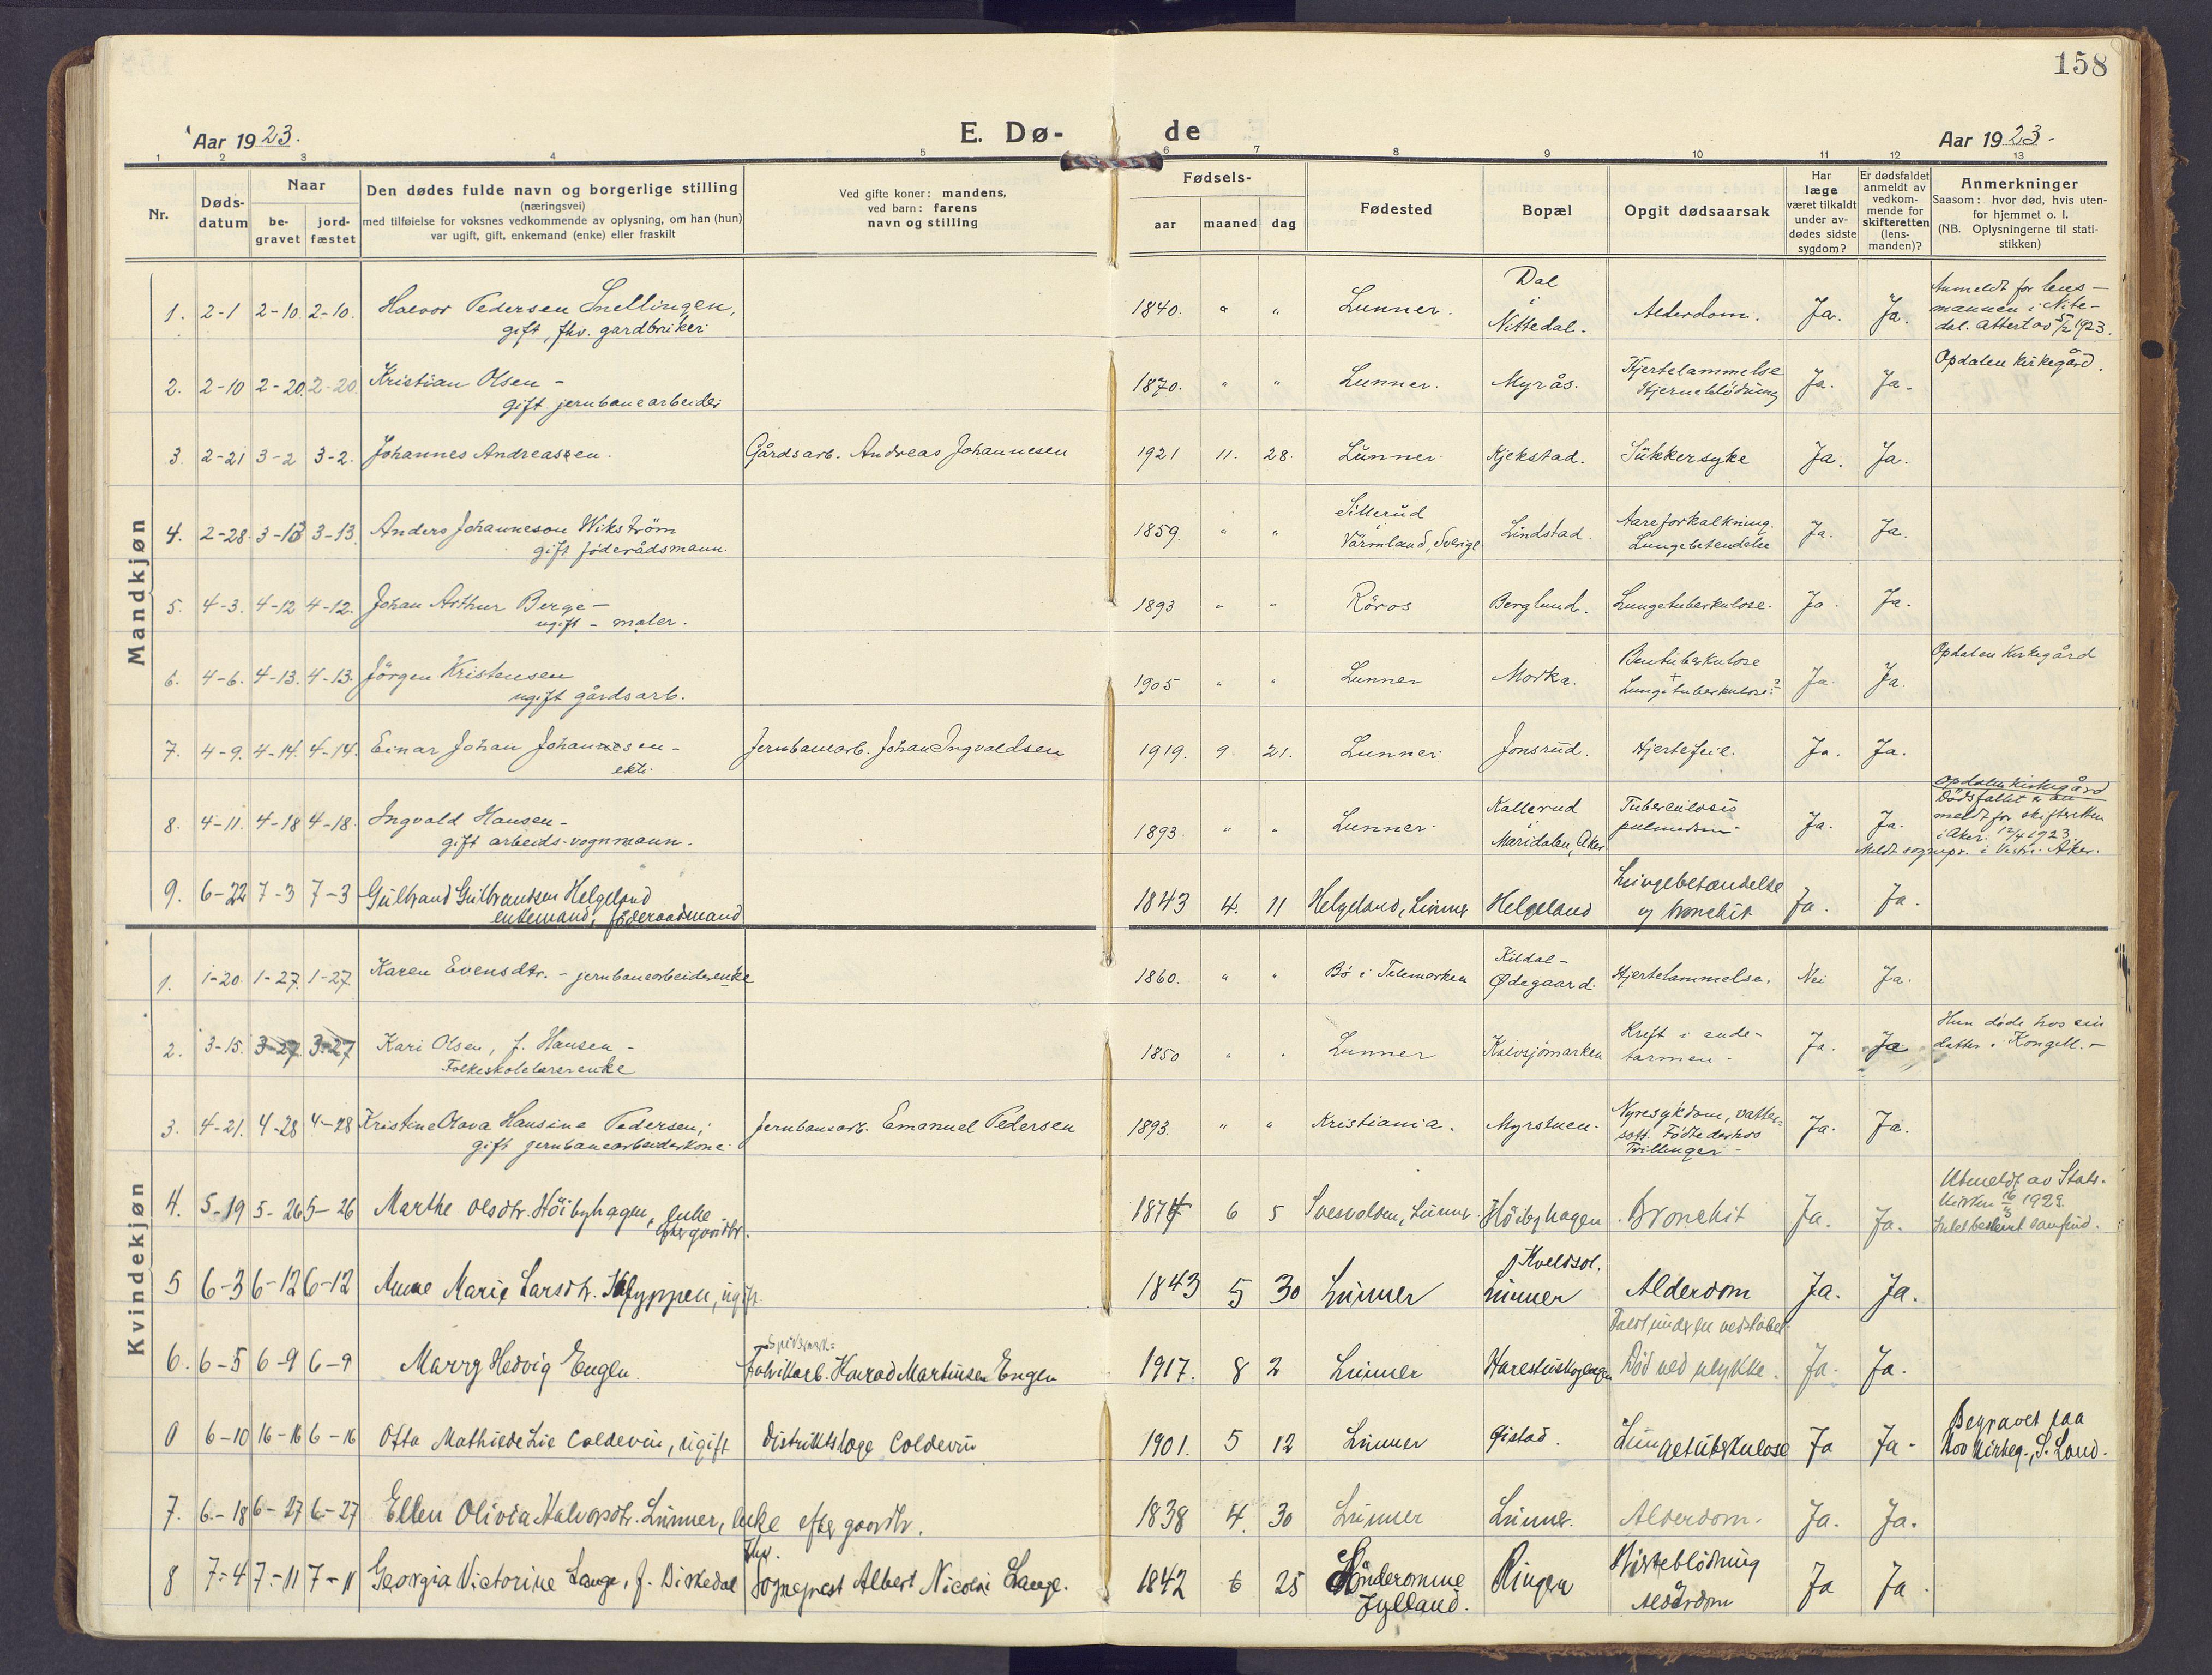 SAH, Lunner prestekontor, H/Ha/Haa/L0002: Ministerialbok nr. 2, 1922-1931, s. 158